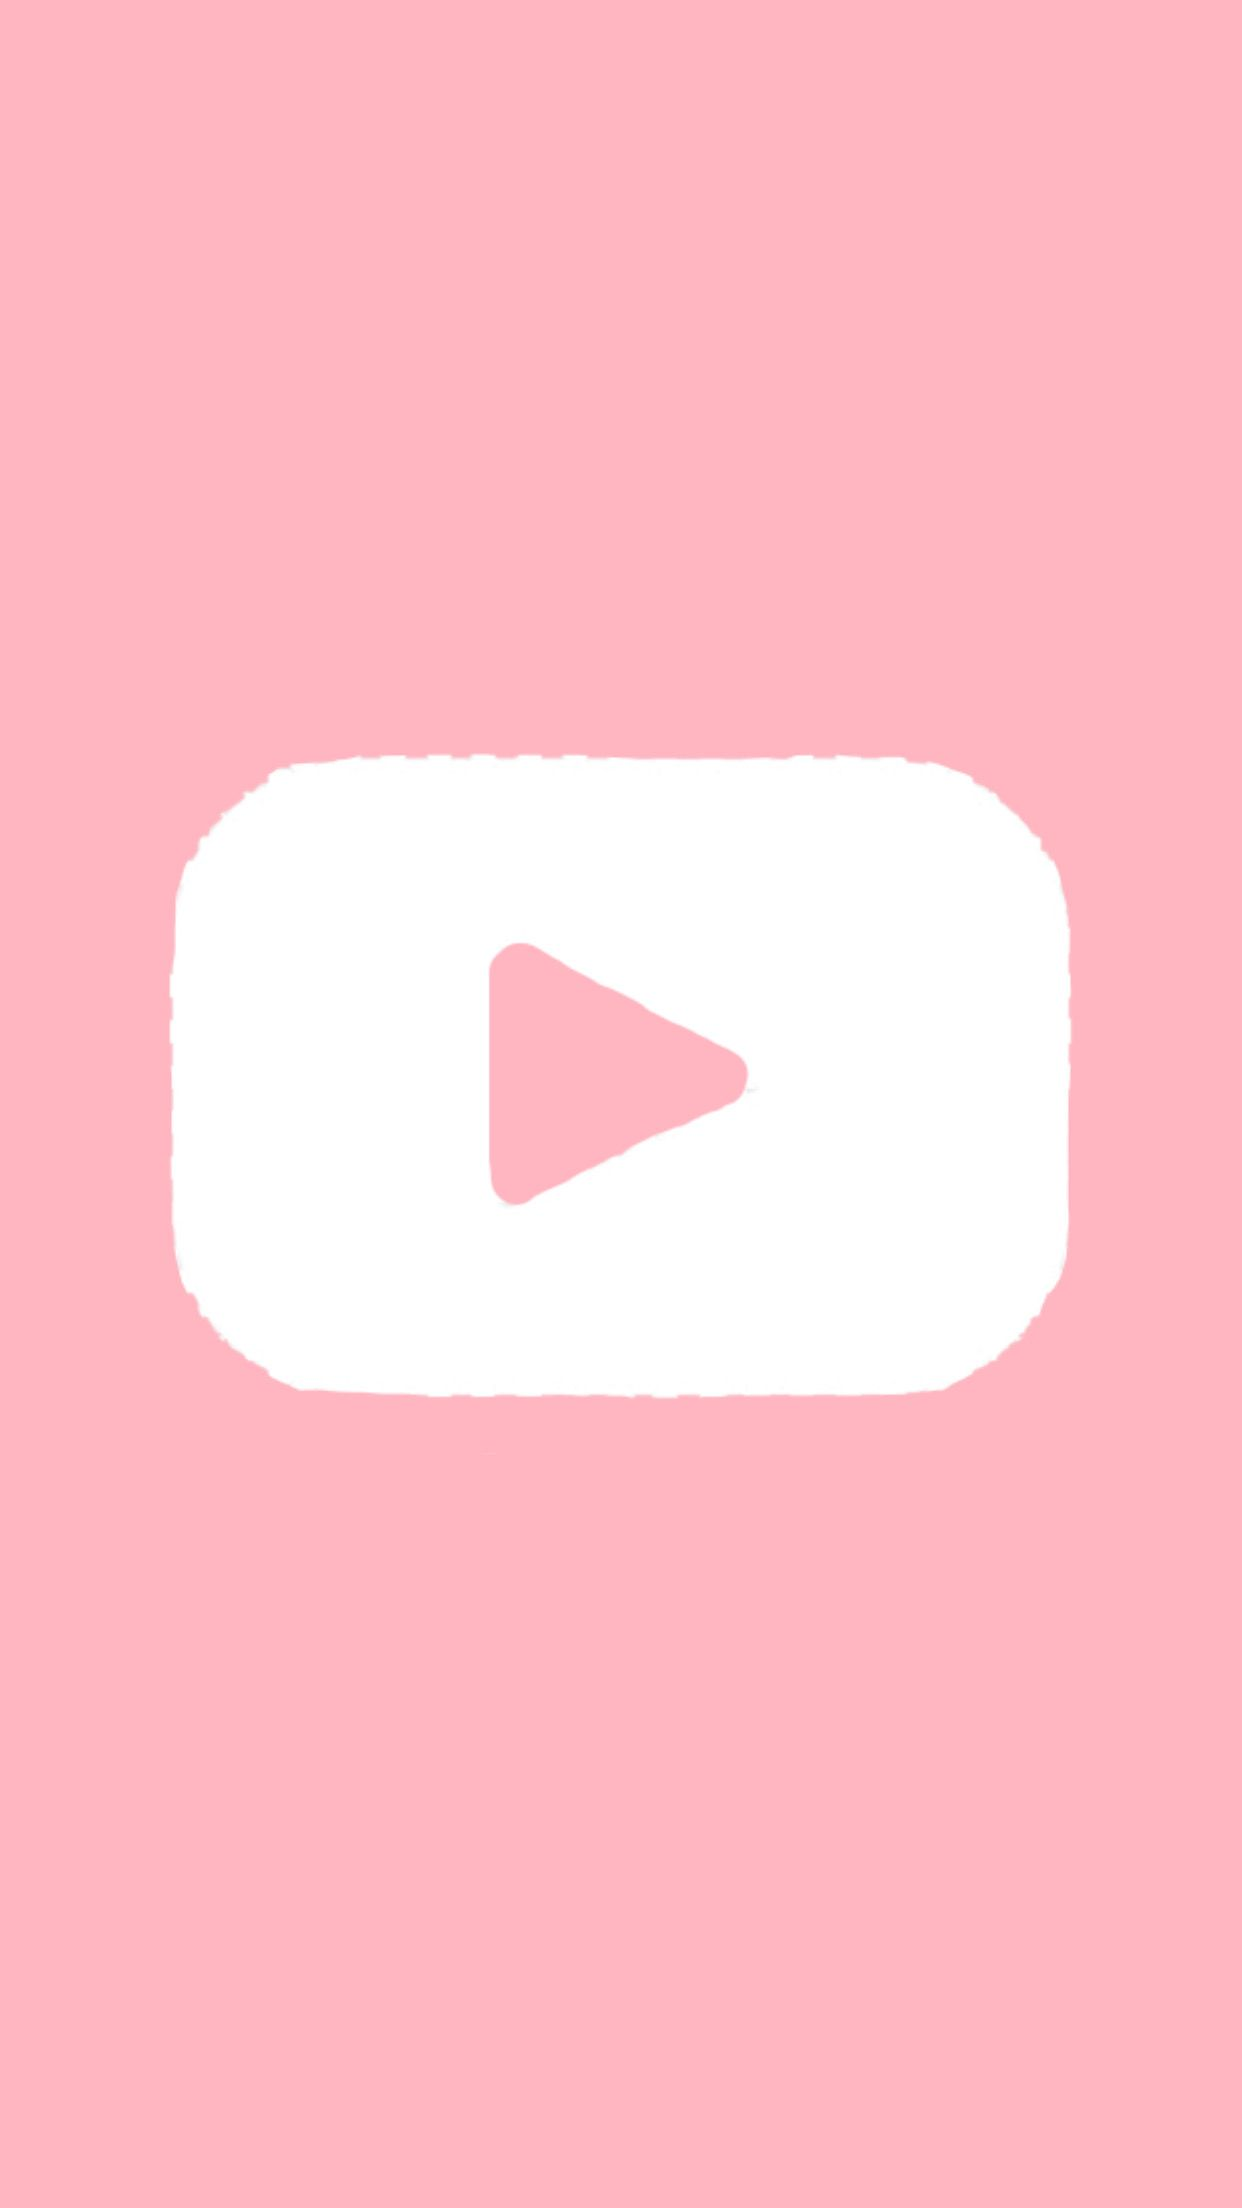 Youtube Logo Pink White Freetoedit Ios App Icon Design Iphone Photo App App Icon